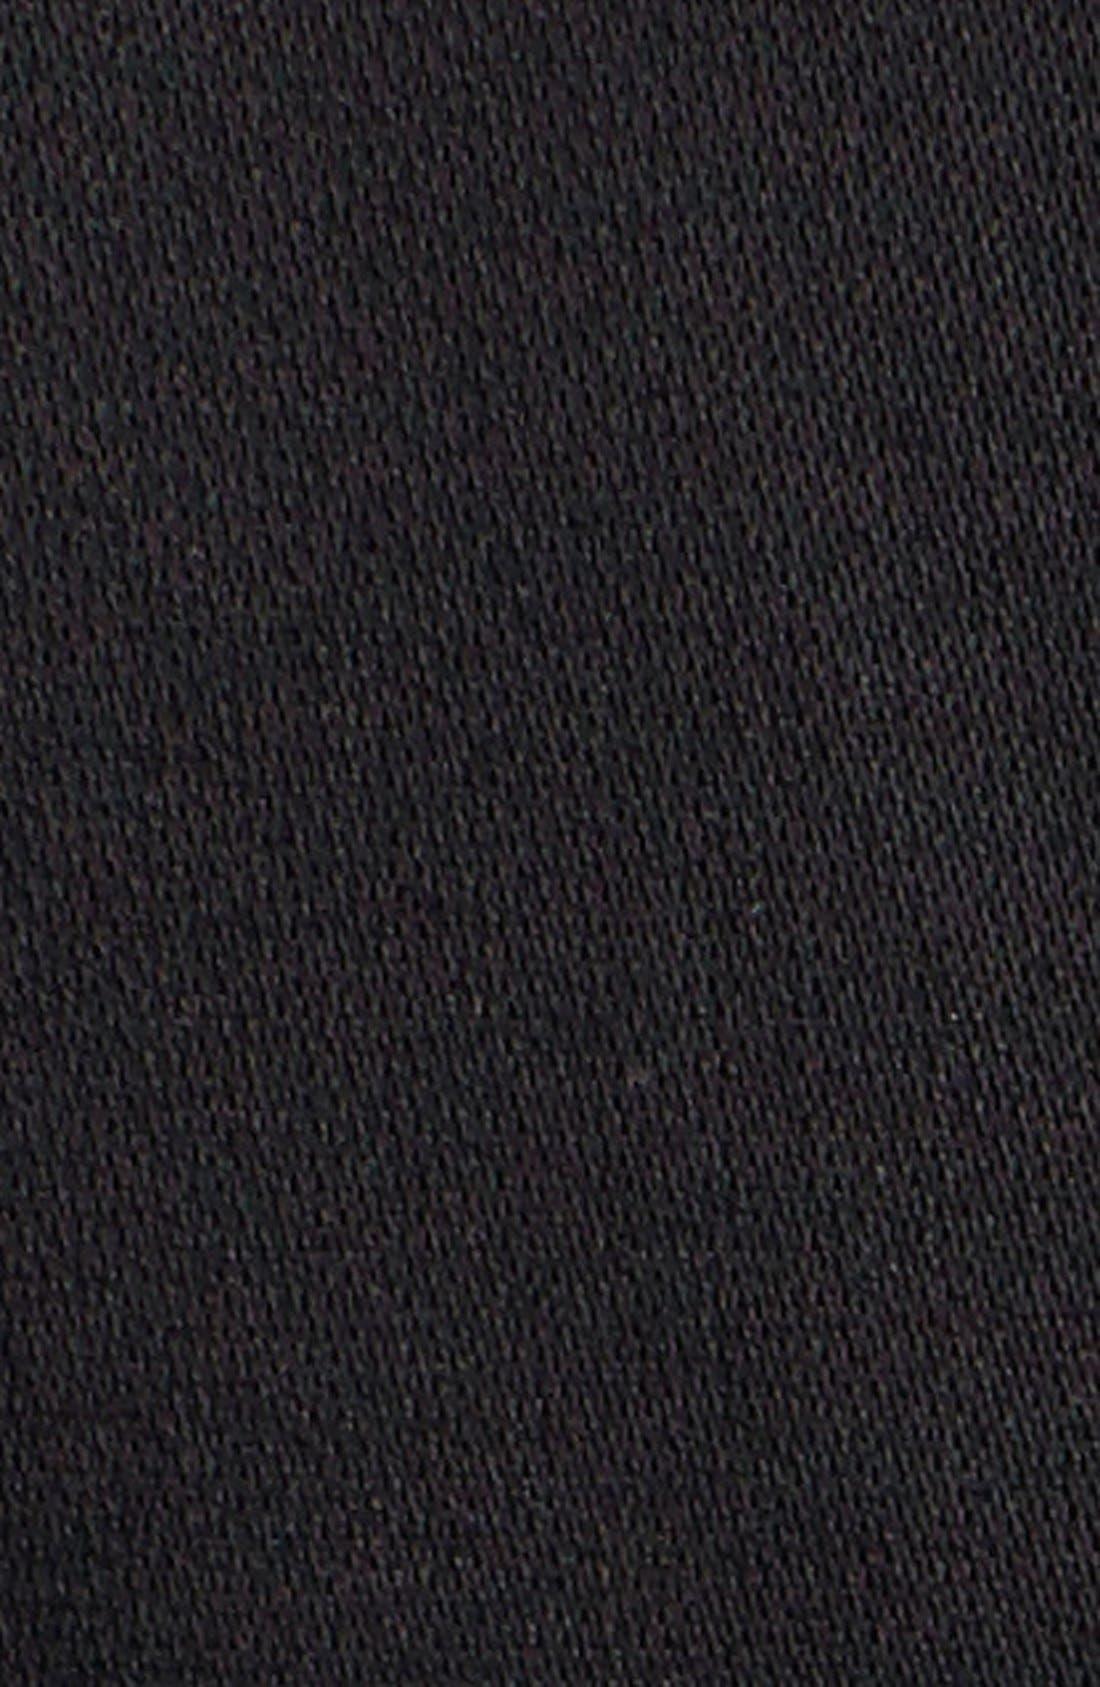 MICHAEL MICHAEL KORS,                             Asymmetrical Zip Sateen Trench Coat,                             Alternate thumbnail 2, color,                             001